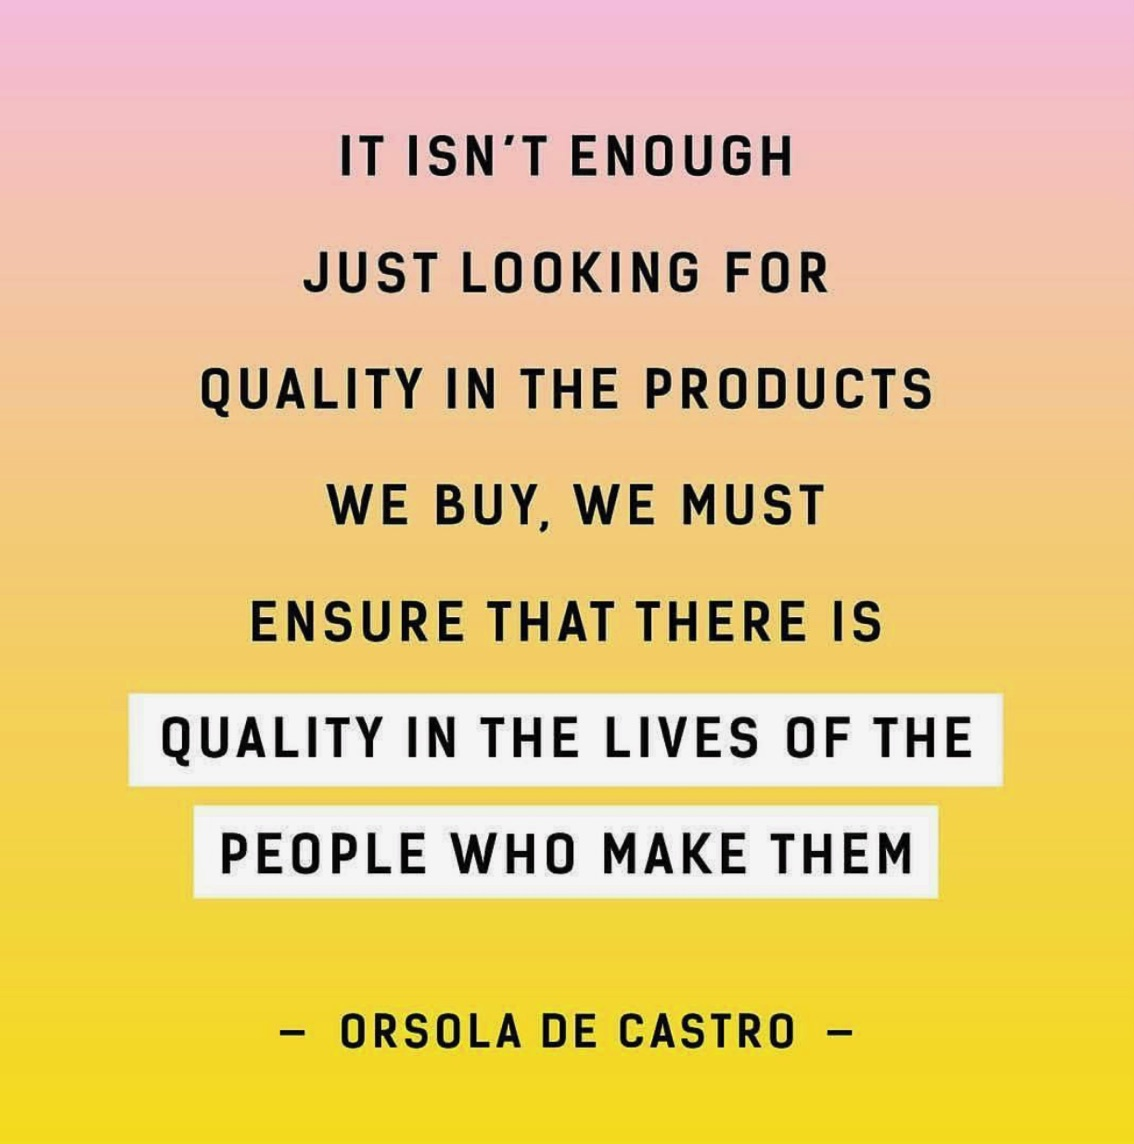 Source: FashionRevolution.org